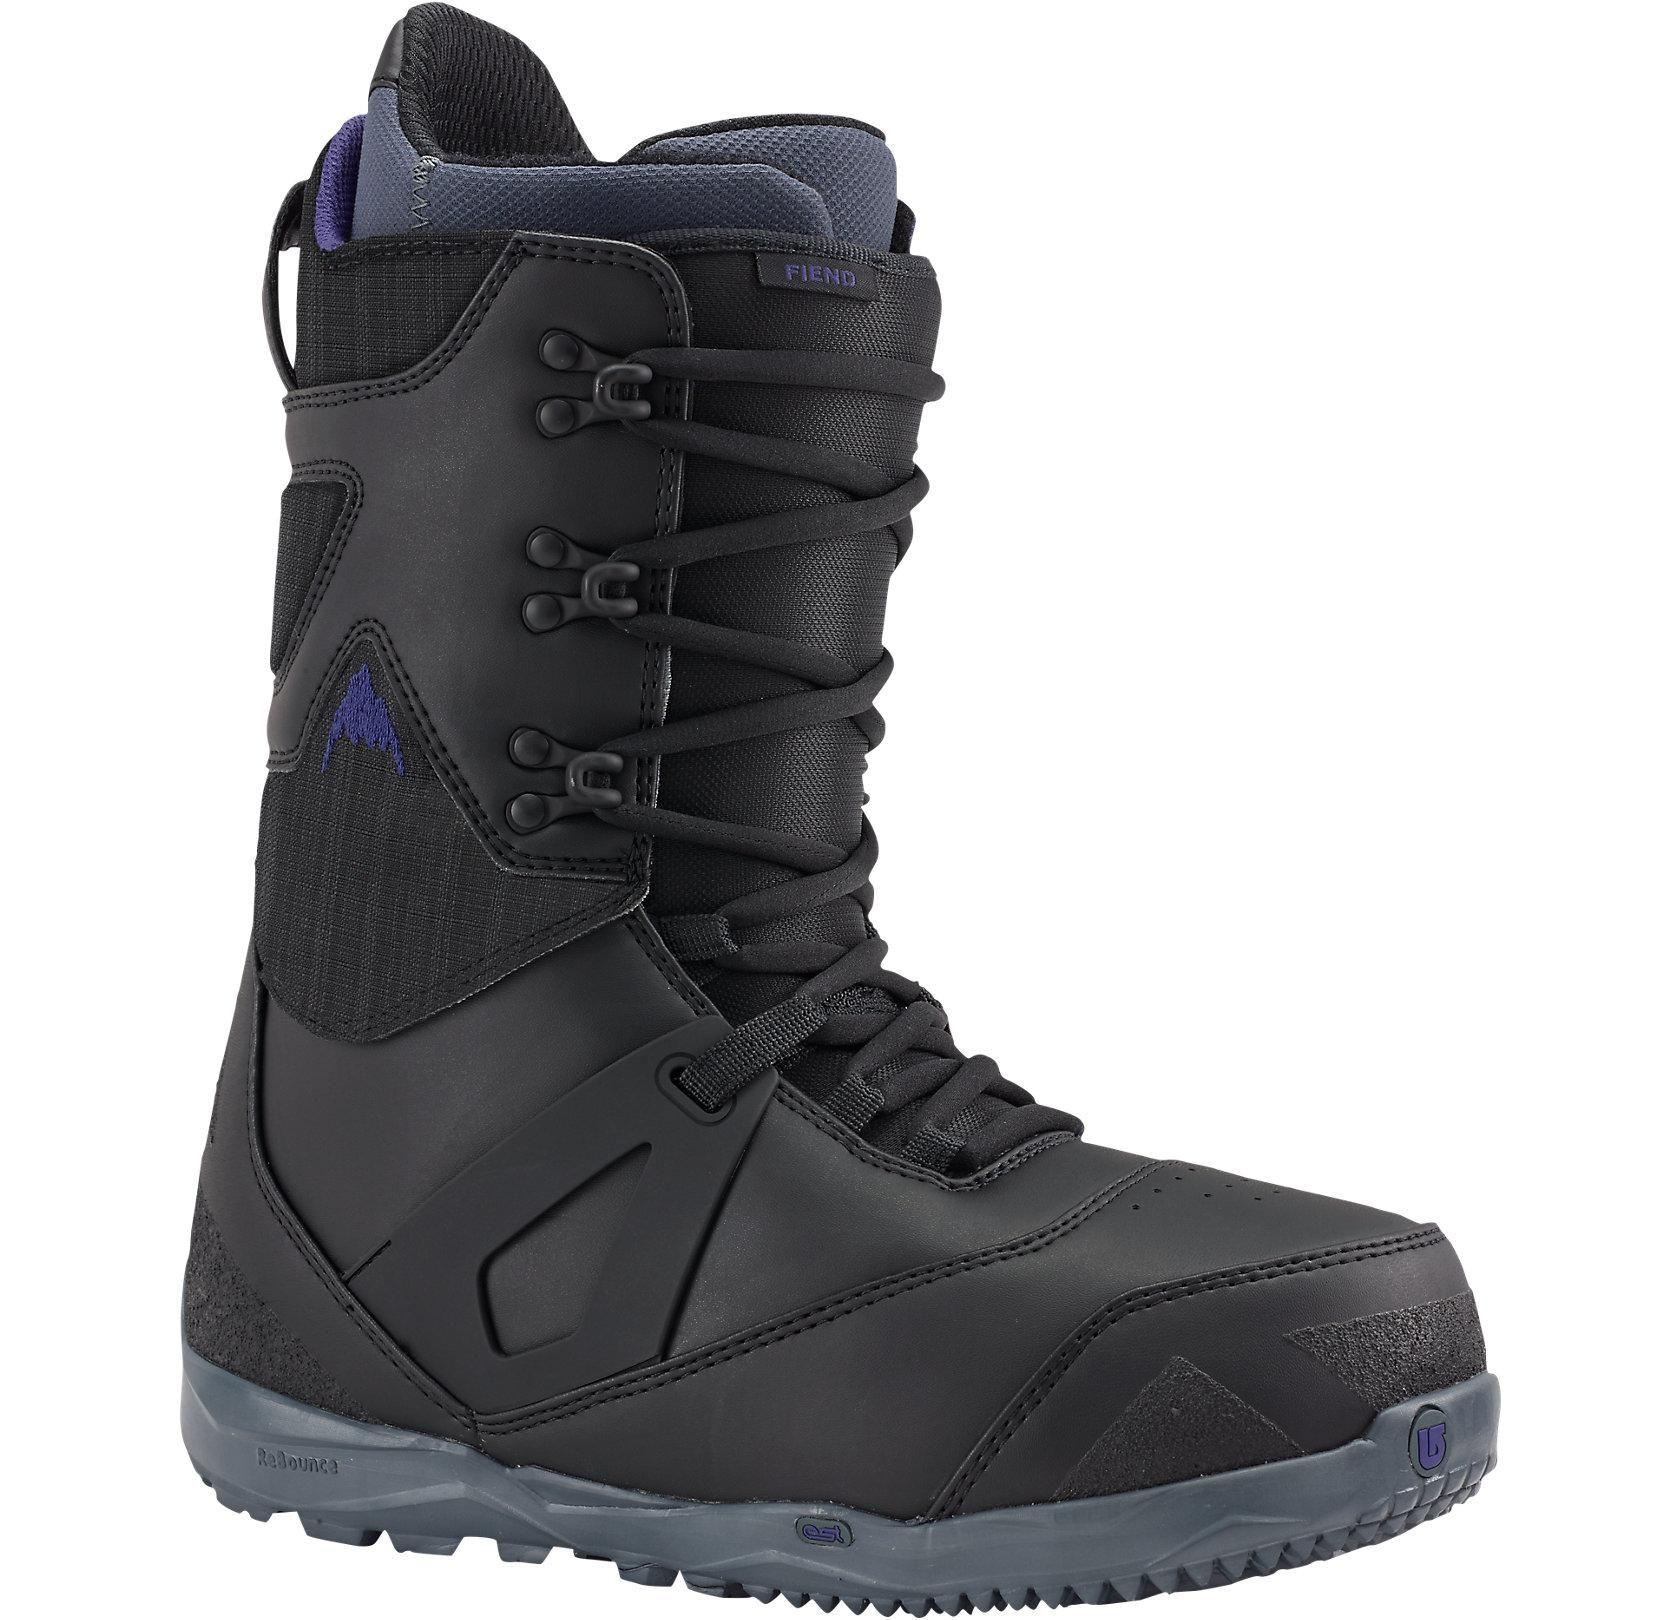 new product e8e5d f2cb9 ... Nike LunarENDOR QS Snowboard Boots Outdoors Pinterest ...